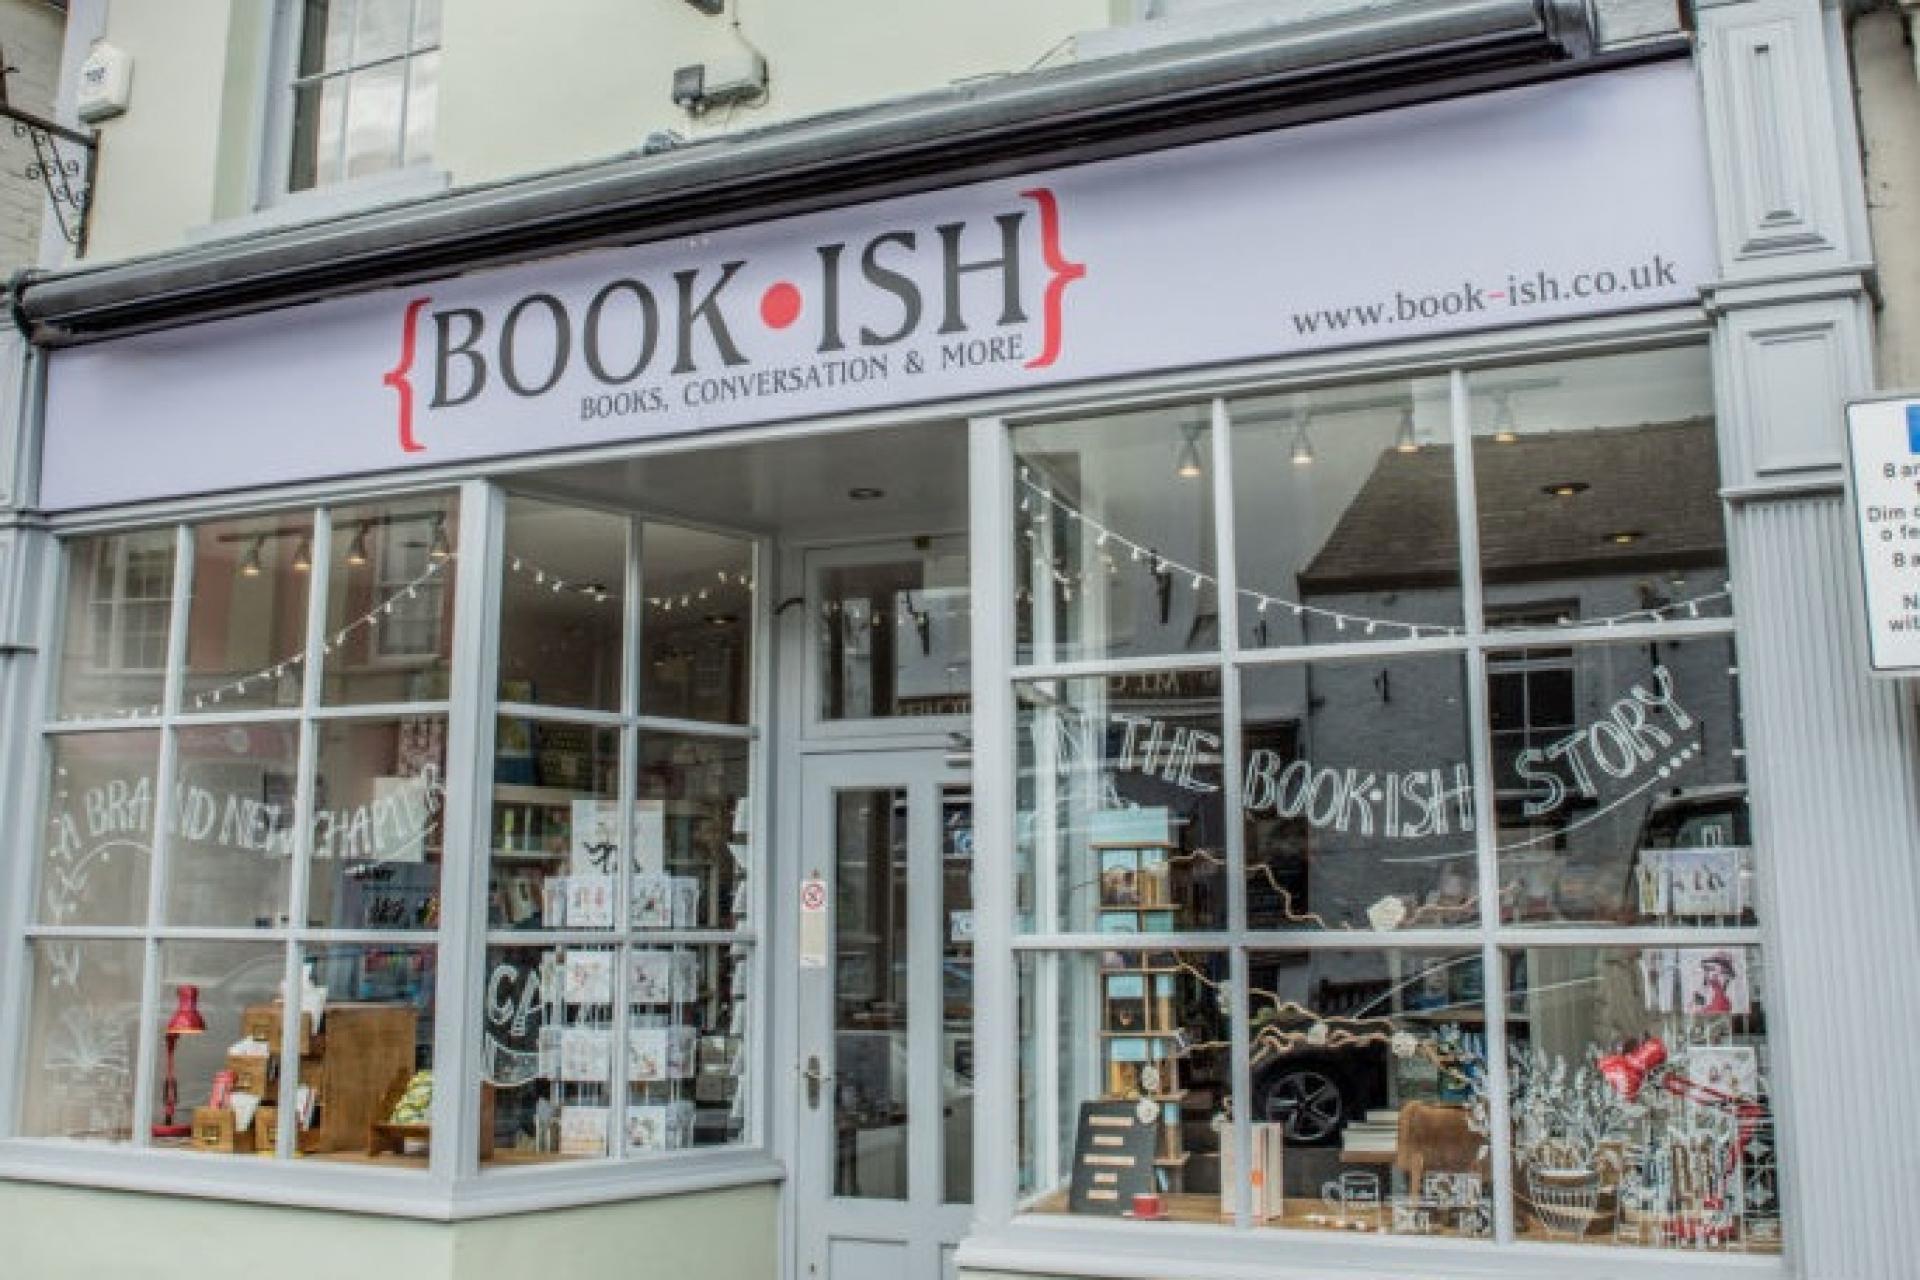 Bookshop of the Month: Book-ish, Crickhowell